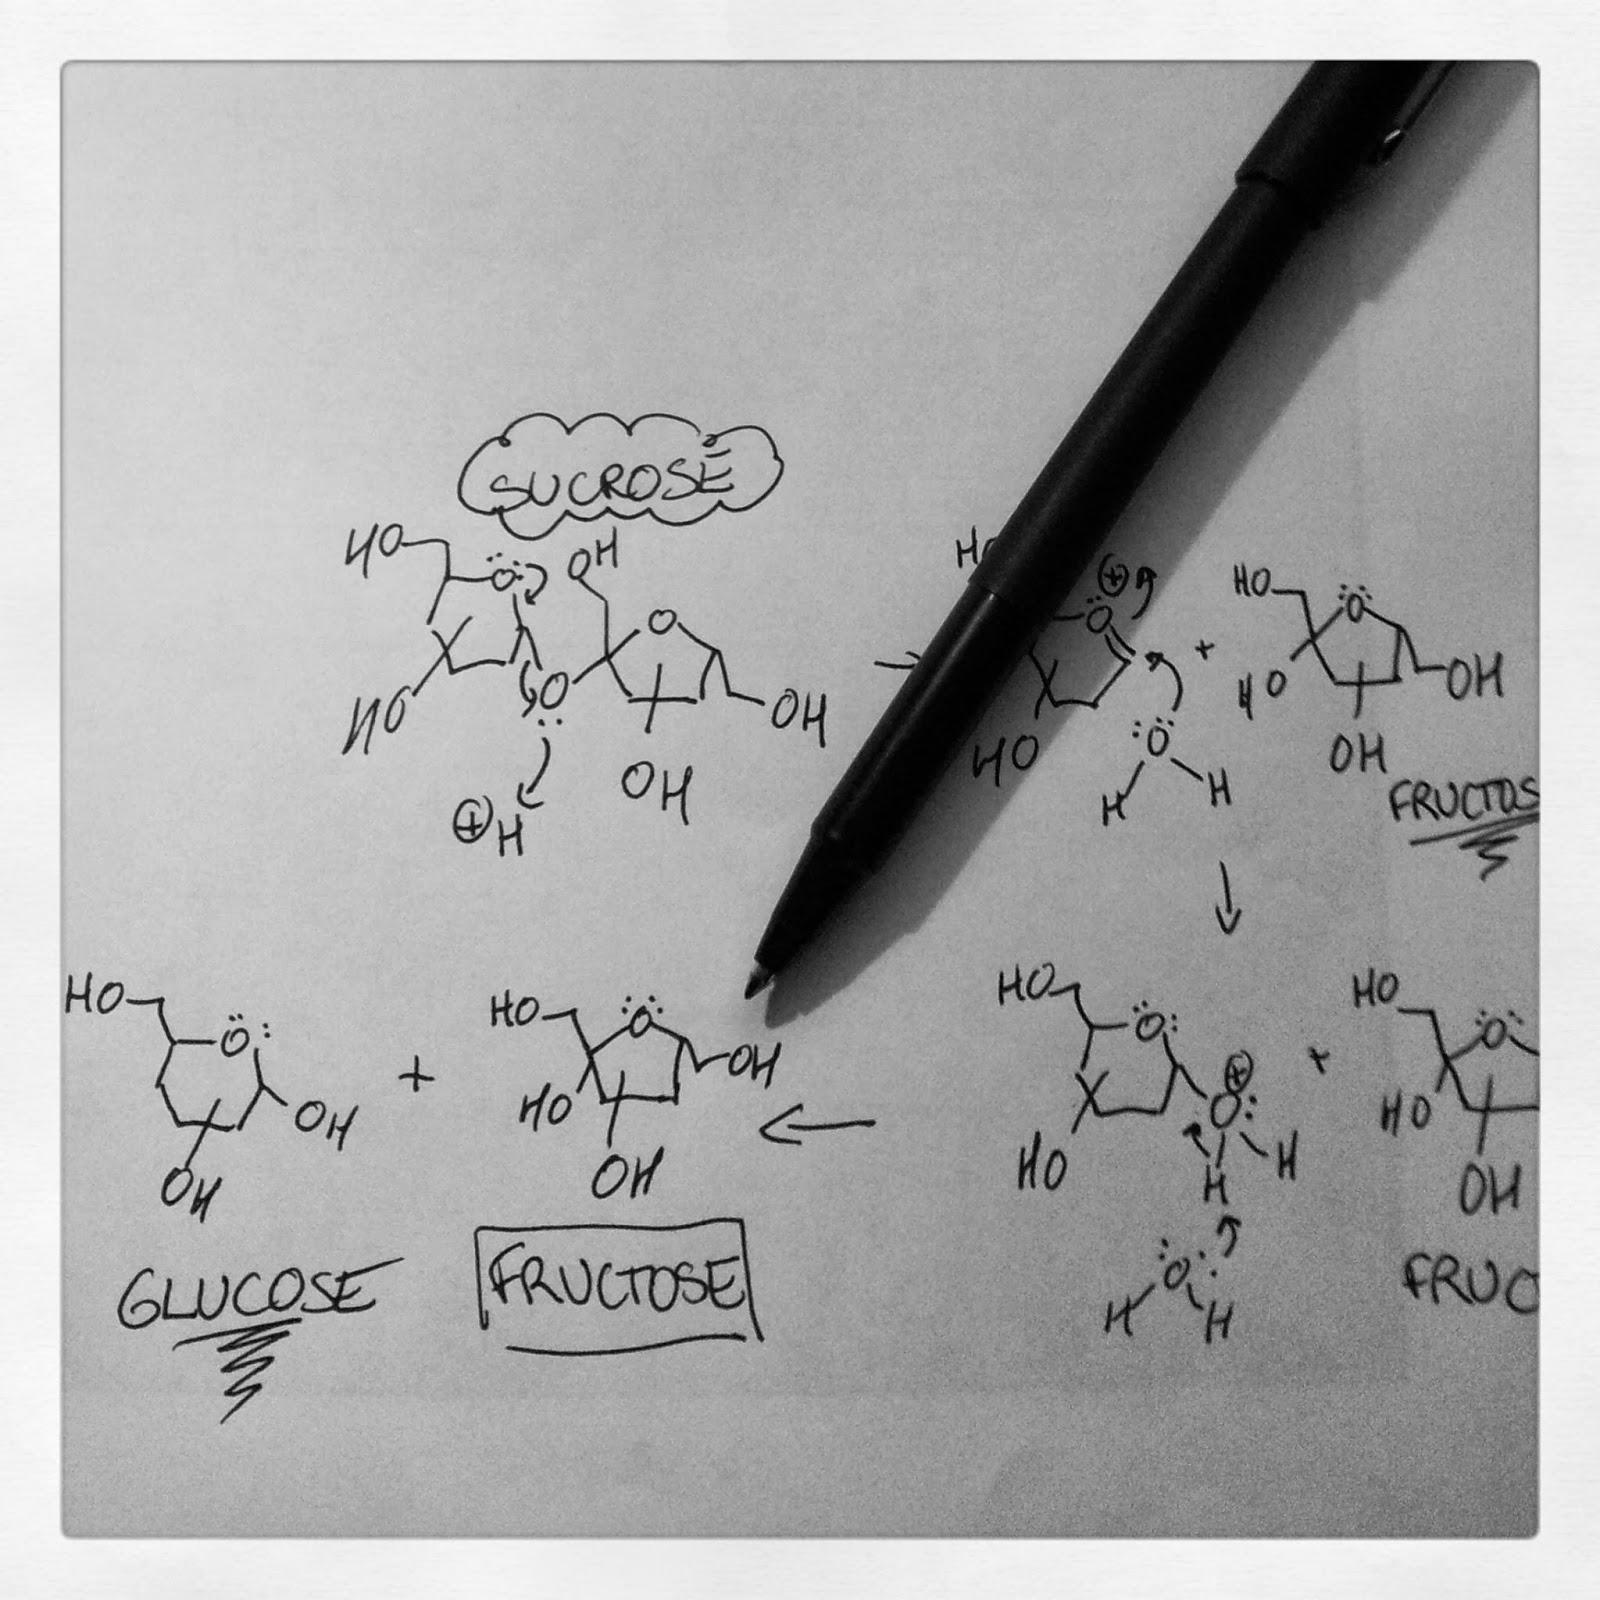 acid-catalyzed hydrolysis of sucrose | kitchen heals soul